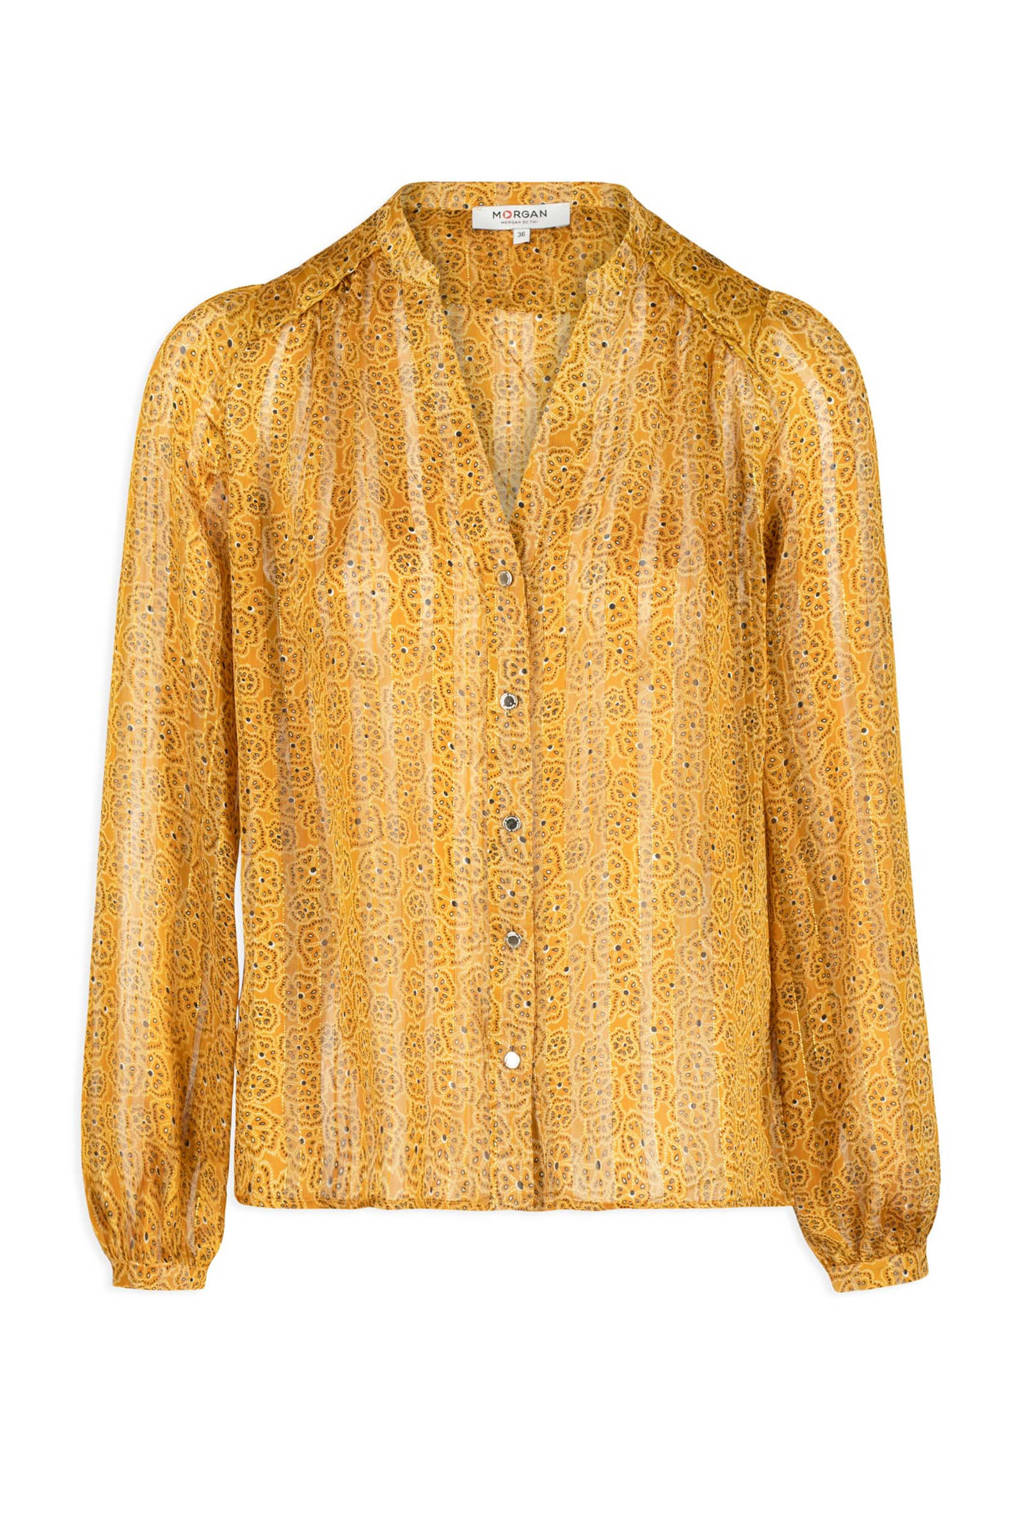 Morgan gebloemde semi-transparante blouse okergeel, Okergeel